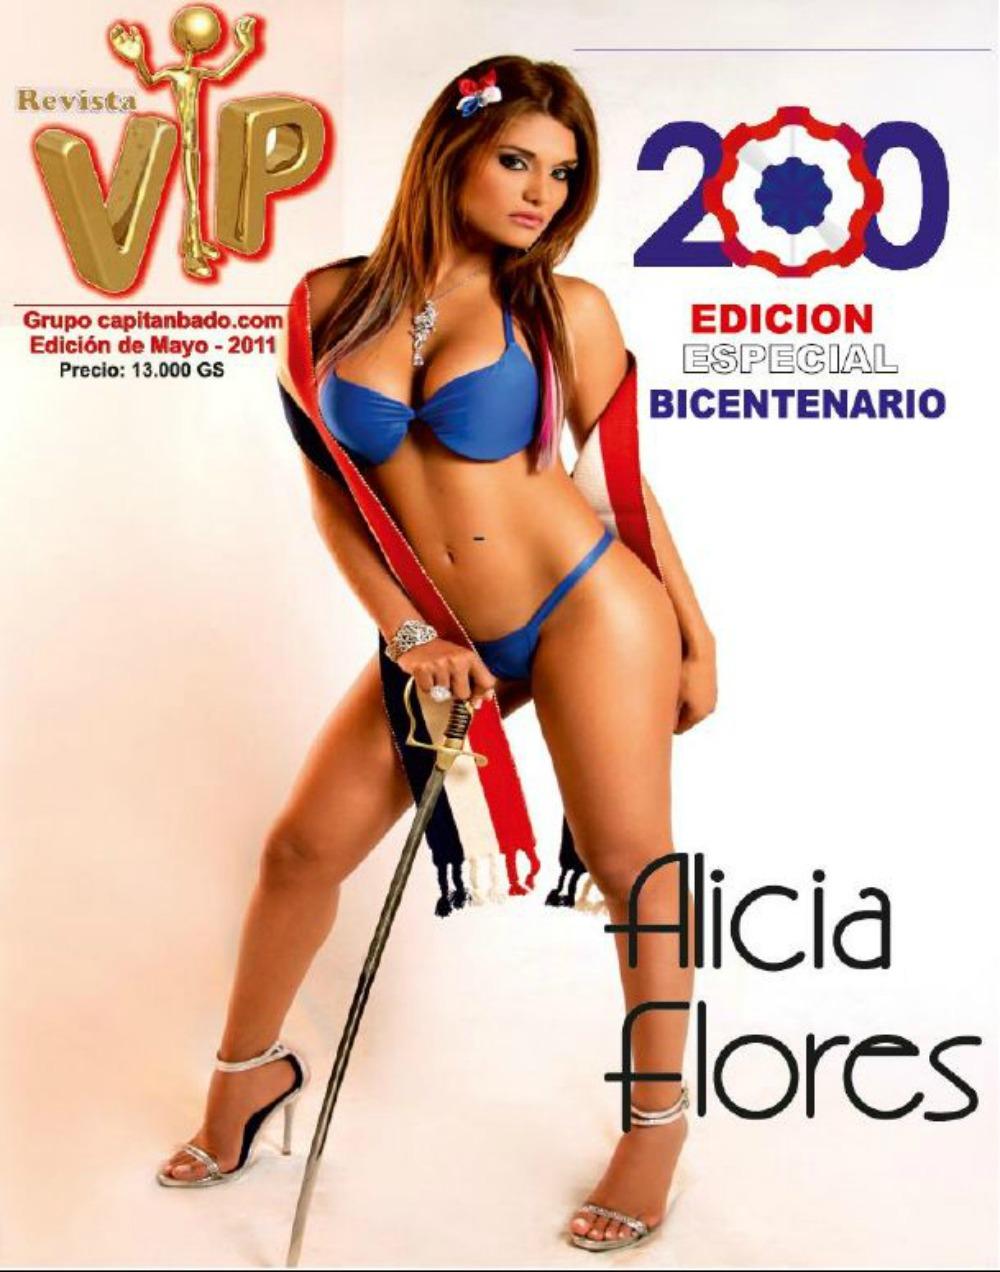 Vip 2 Paraguay